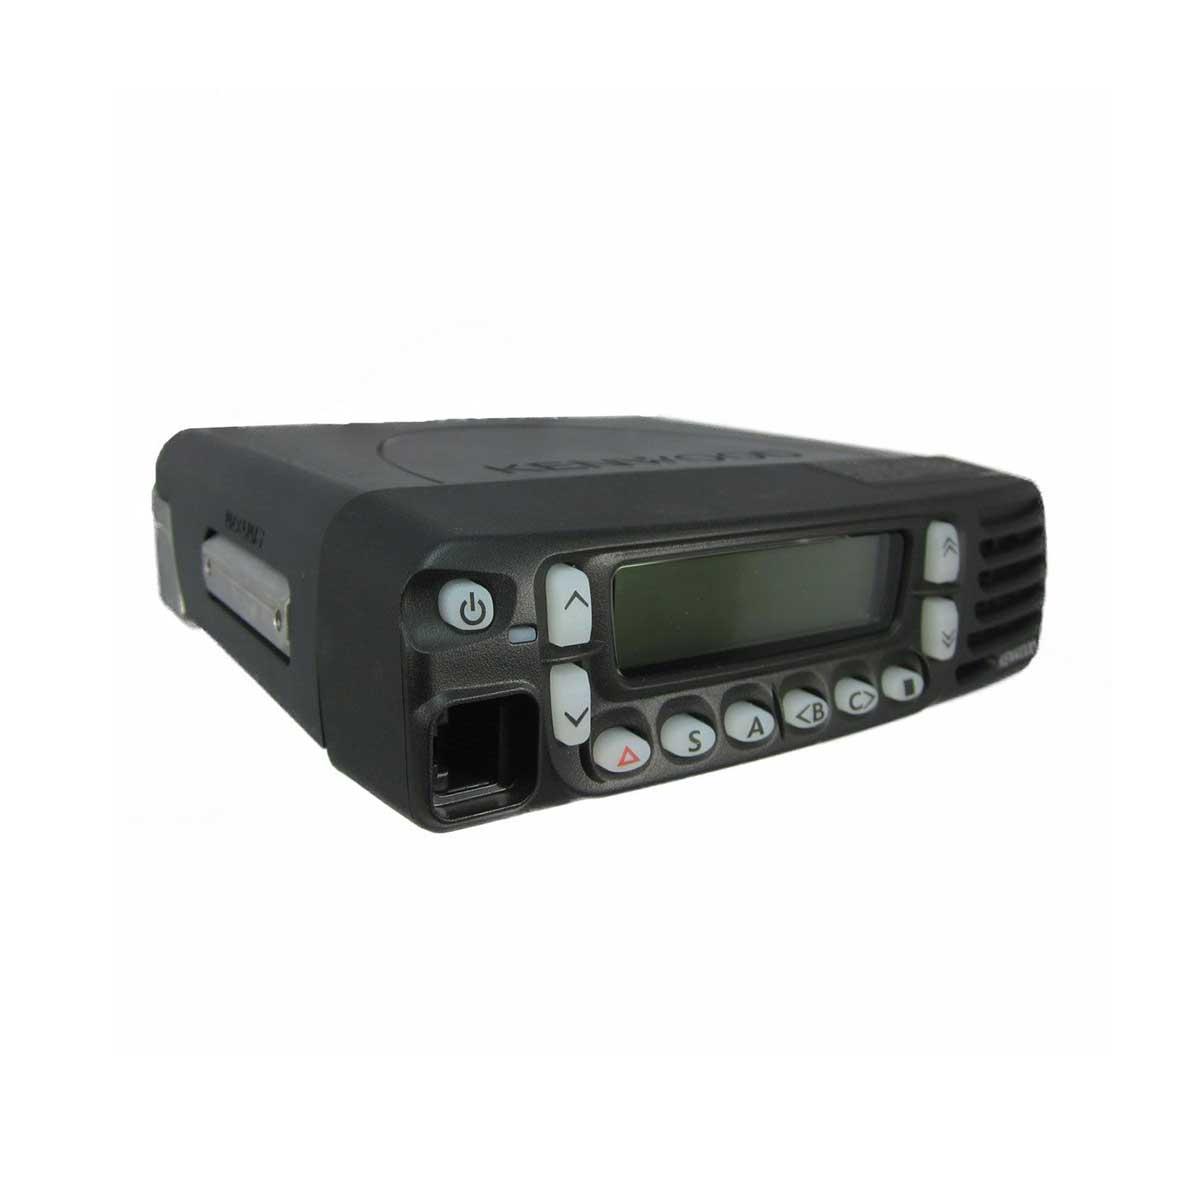 Radio Kenwood TK-7180H Analógico VHF 136-174 MHz